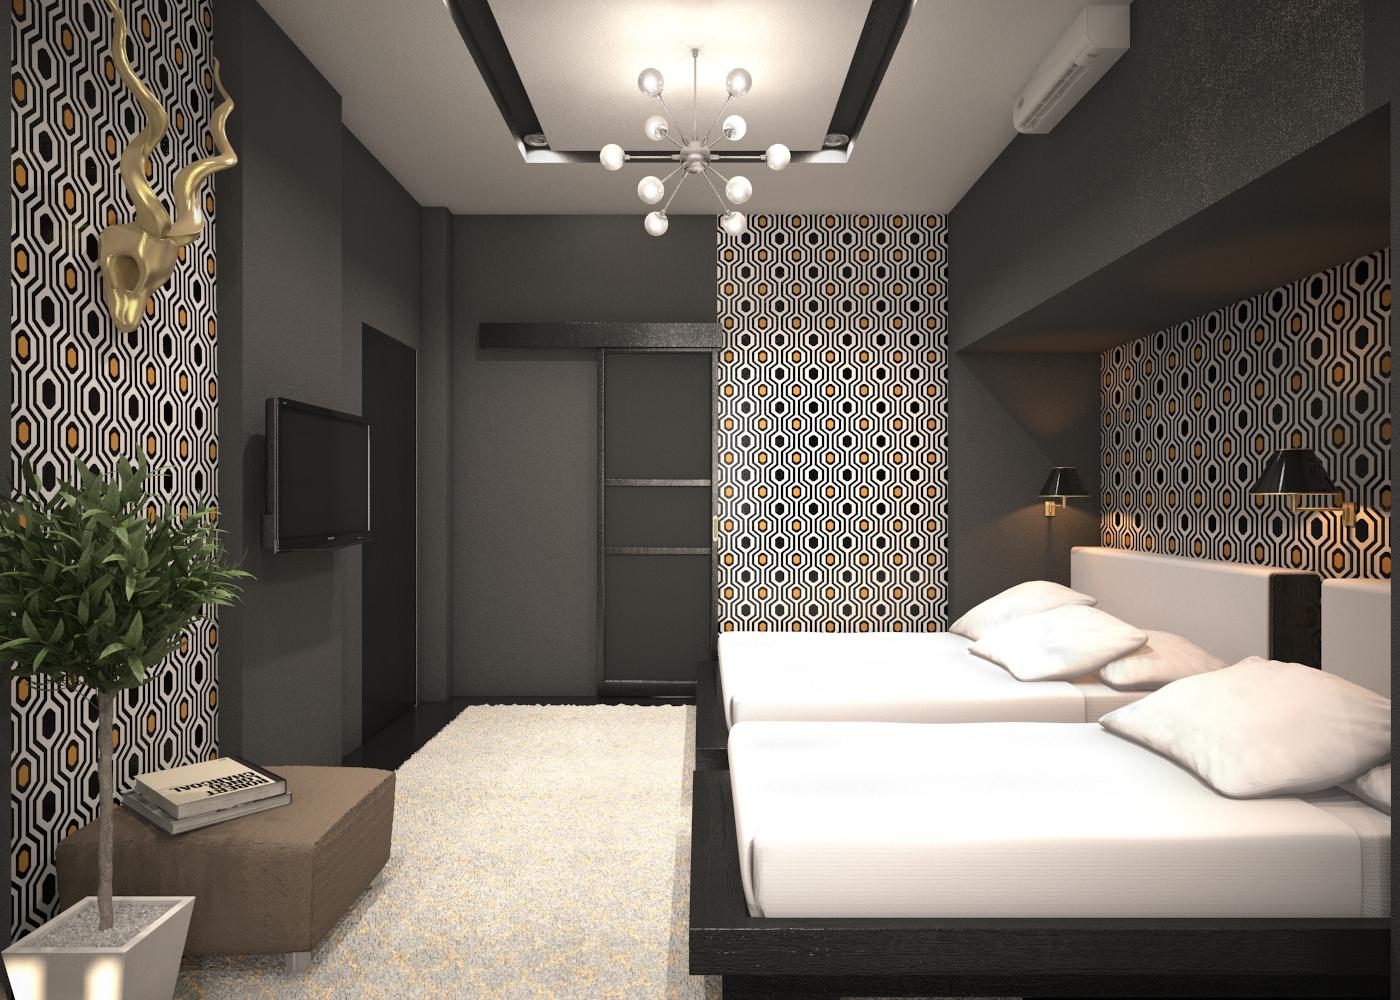 modern hotel room freelancers 3d rh freelancers3d com model hotel room photography hotel room revit model